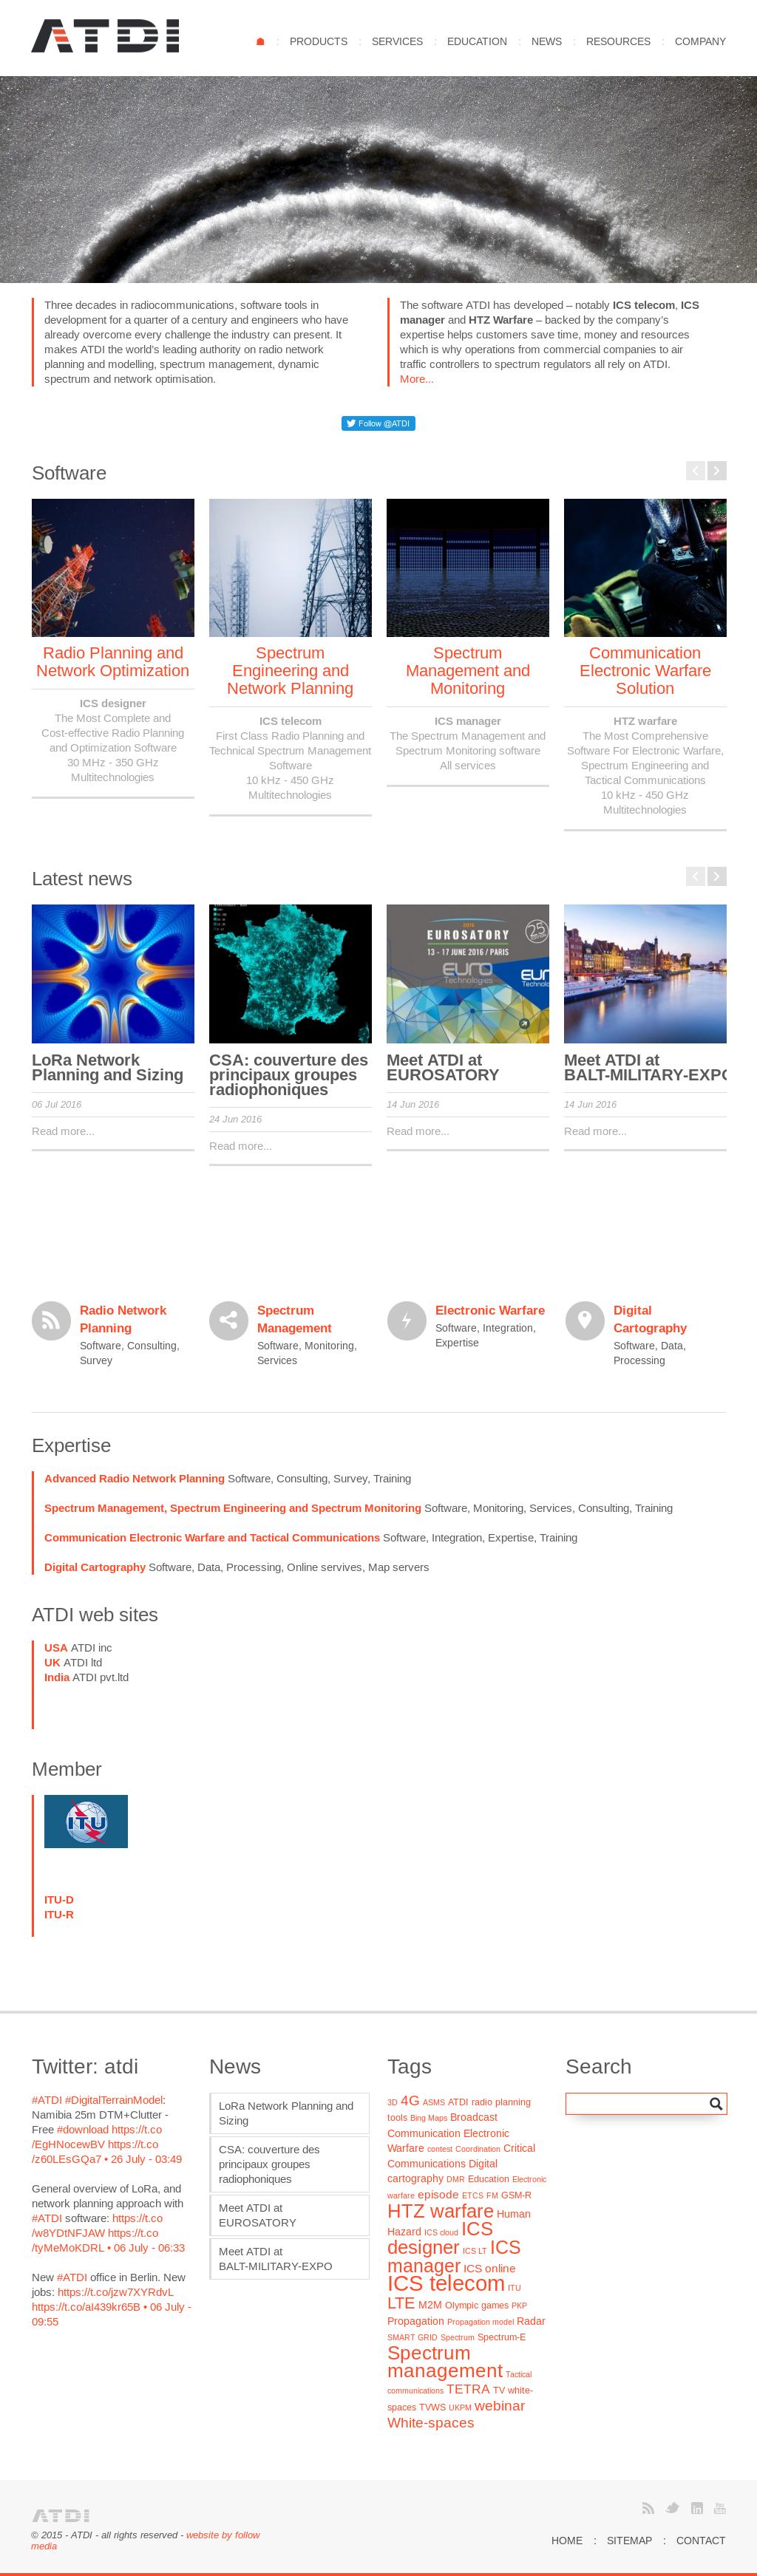 ATDI Competitors, Revenue and Employees - Owler Company Profile